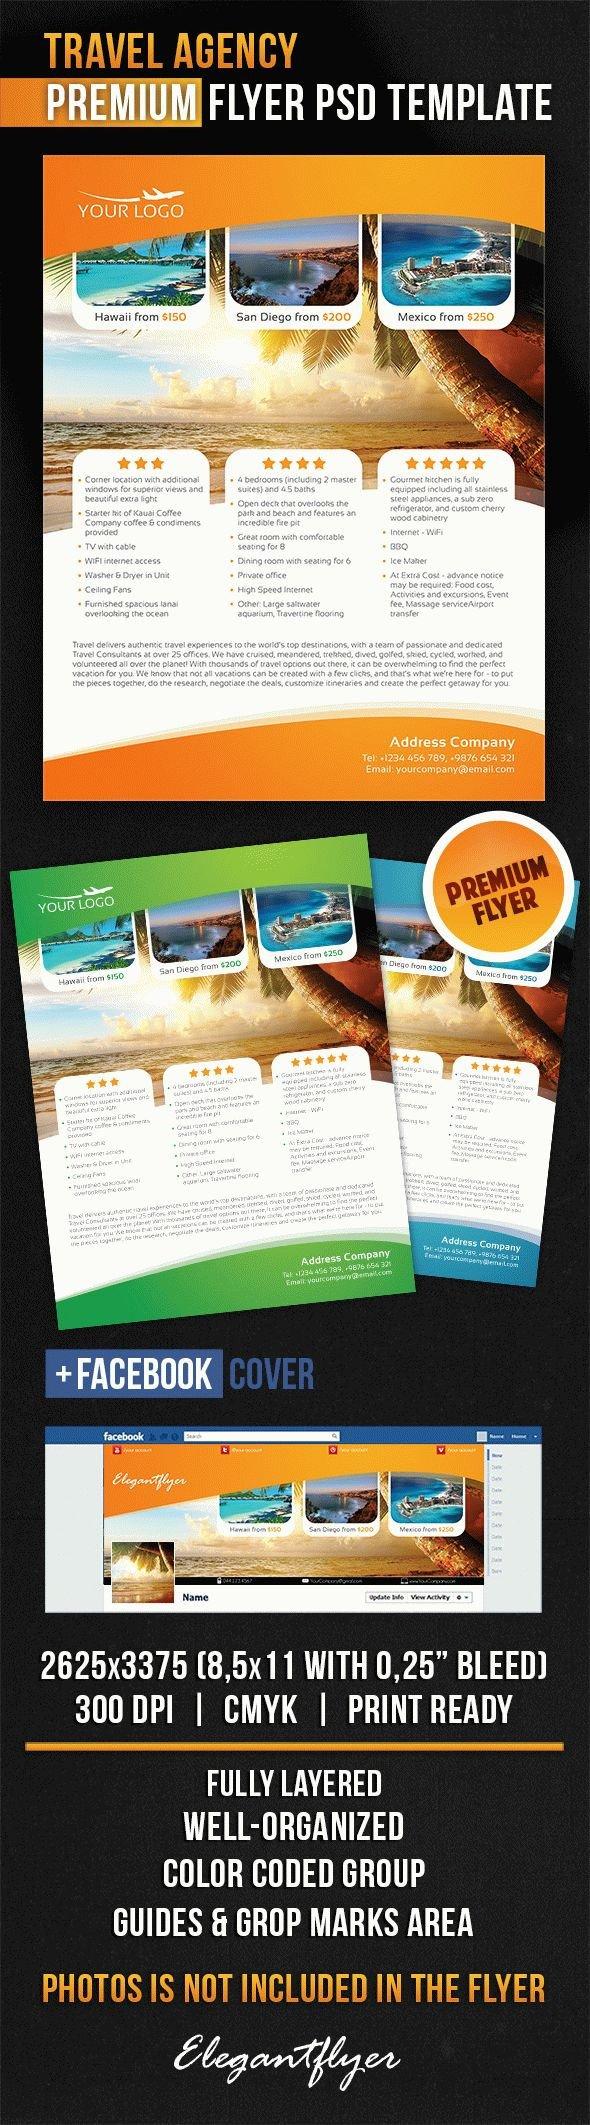 Travel Flyer Template Free Travel Agency – Flyer Psd Template – by Elegantflyer